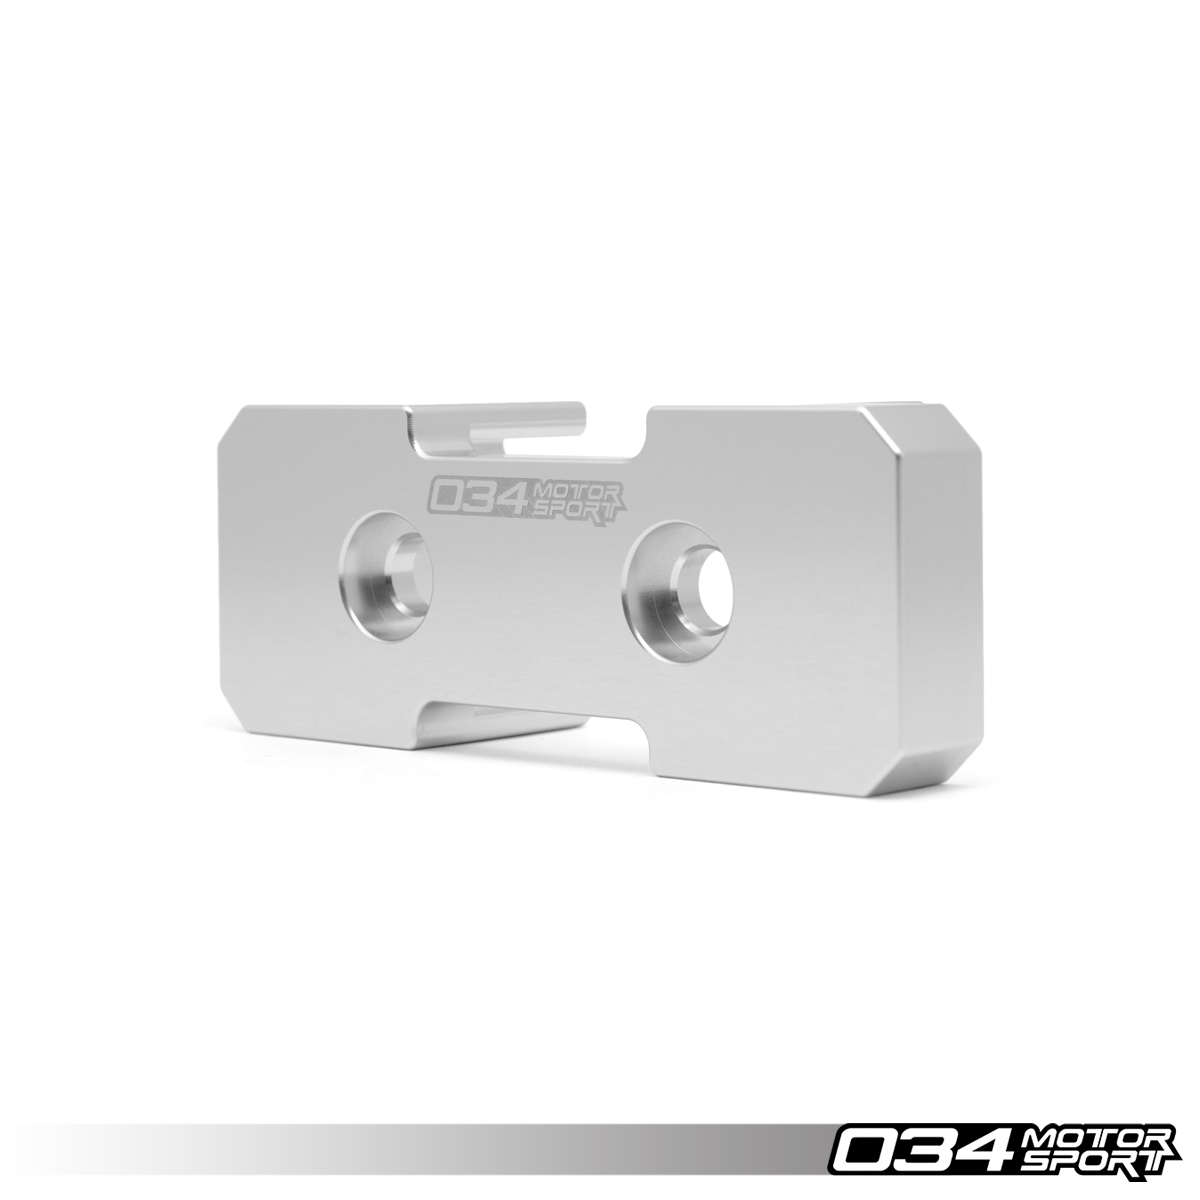 Pin 24v Vr6 Motor Images To Pinterest Engine Diagram